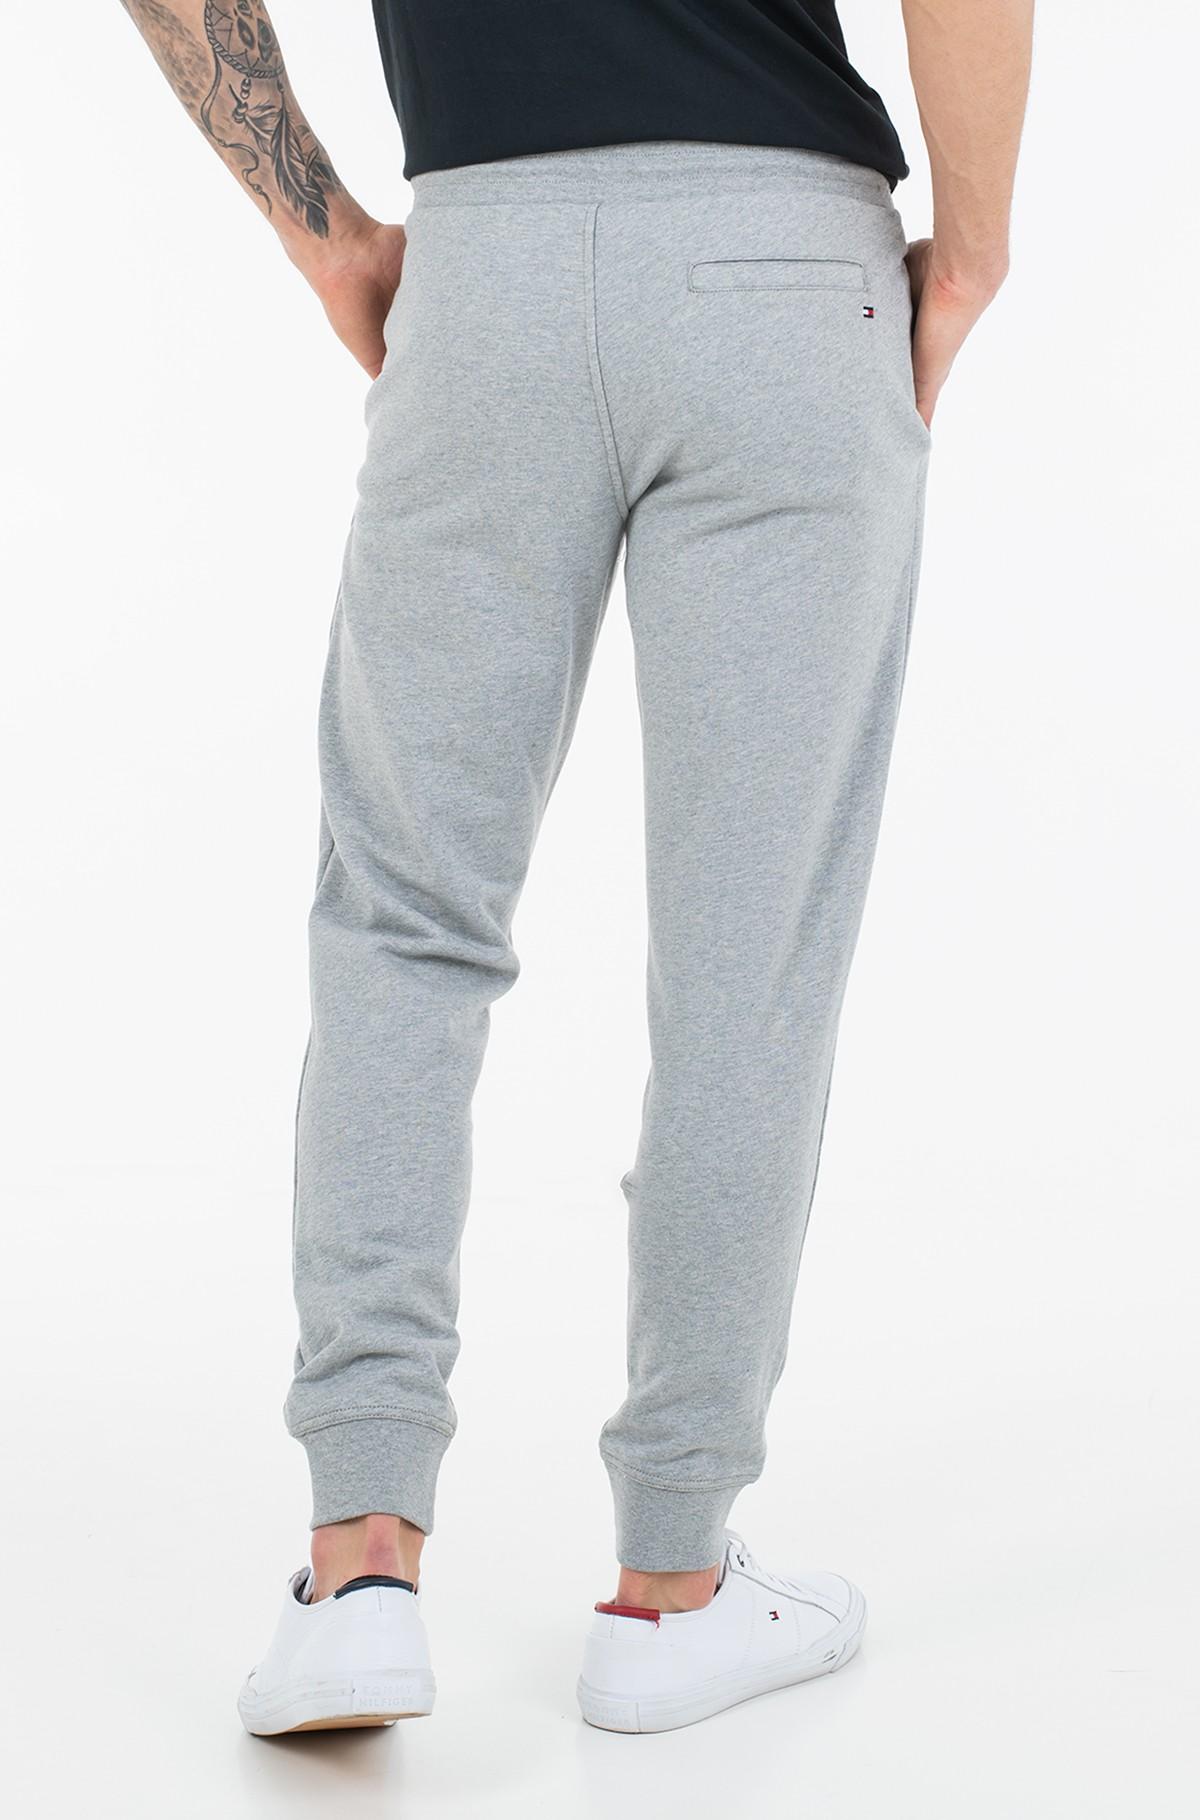 Sweatpants  SWEATPANTS WITH PRINT-full-2